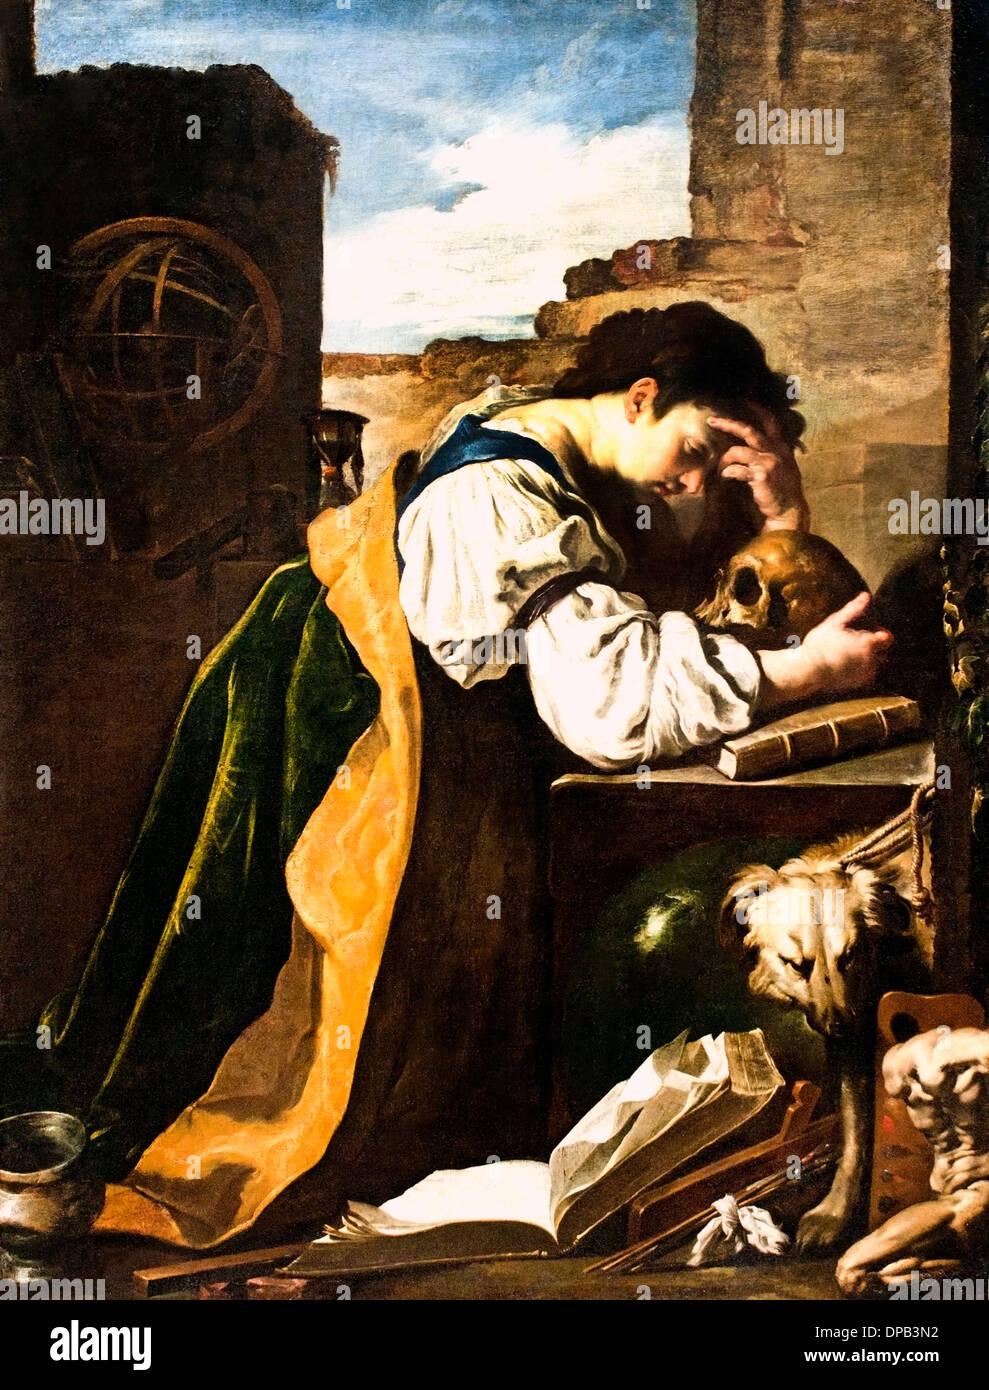 Melancholie 1618-1623 Domenico Fetti 1589 – 1623) Italien Italienisch Stockfoto